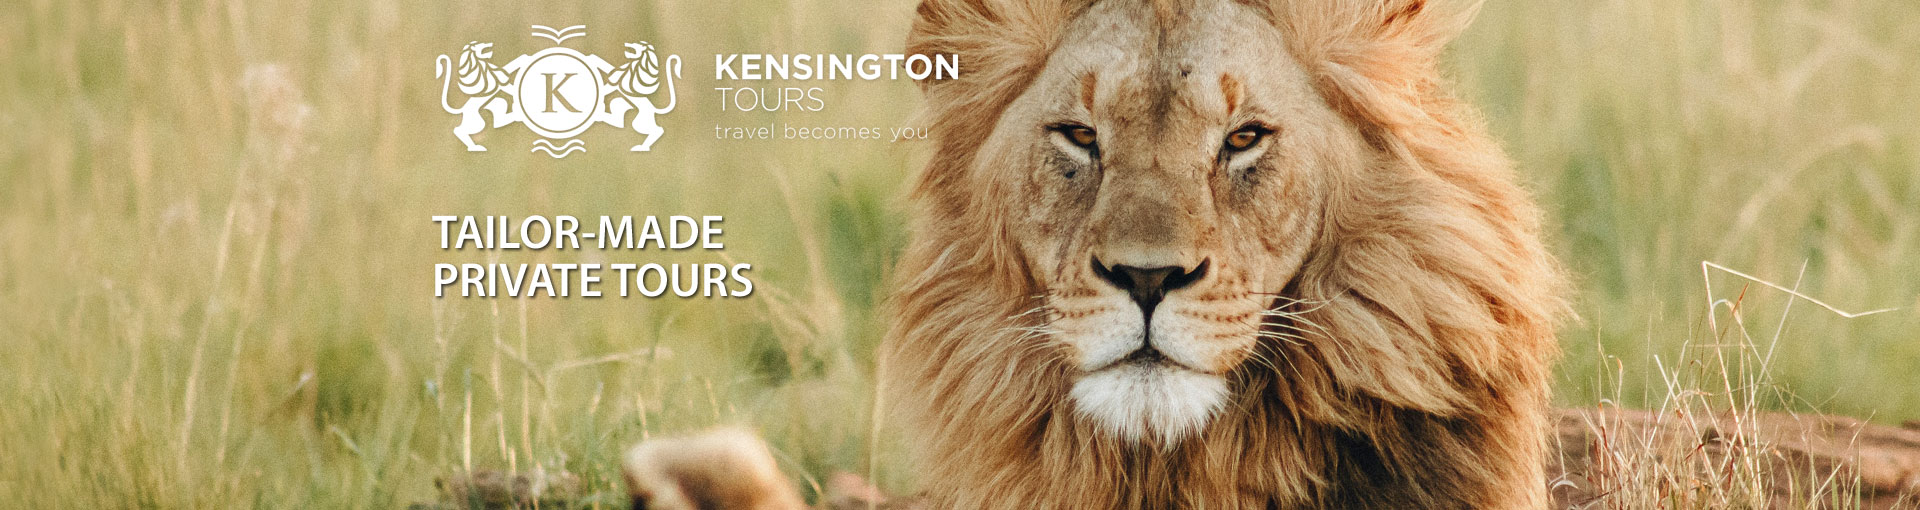 Already Booked with Kensington Tours